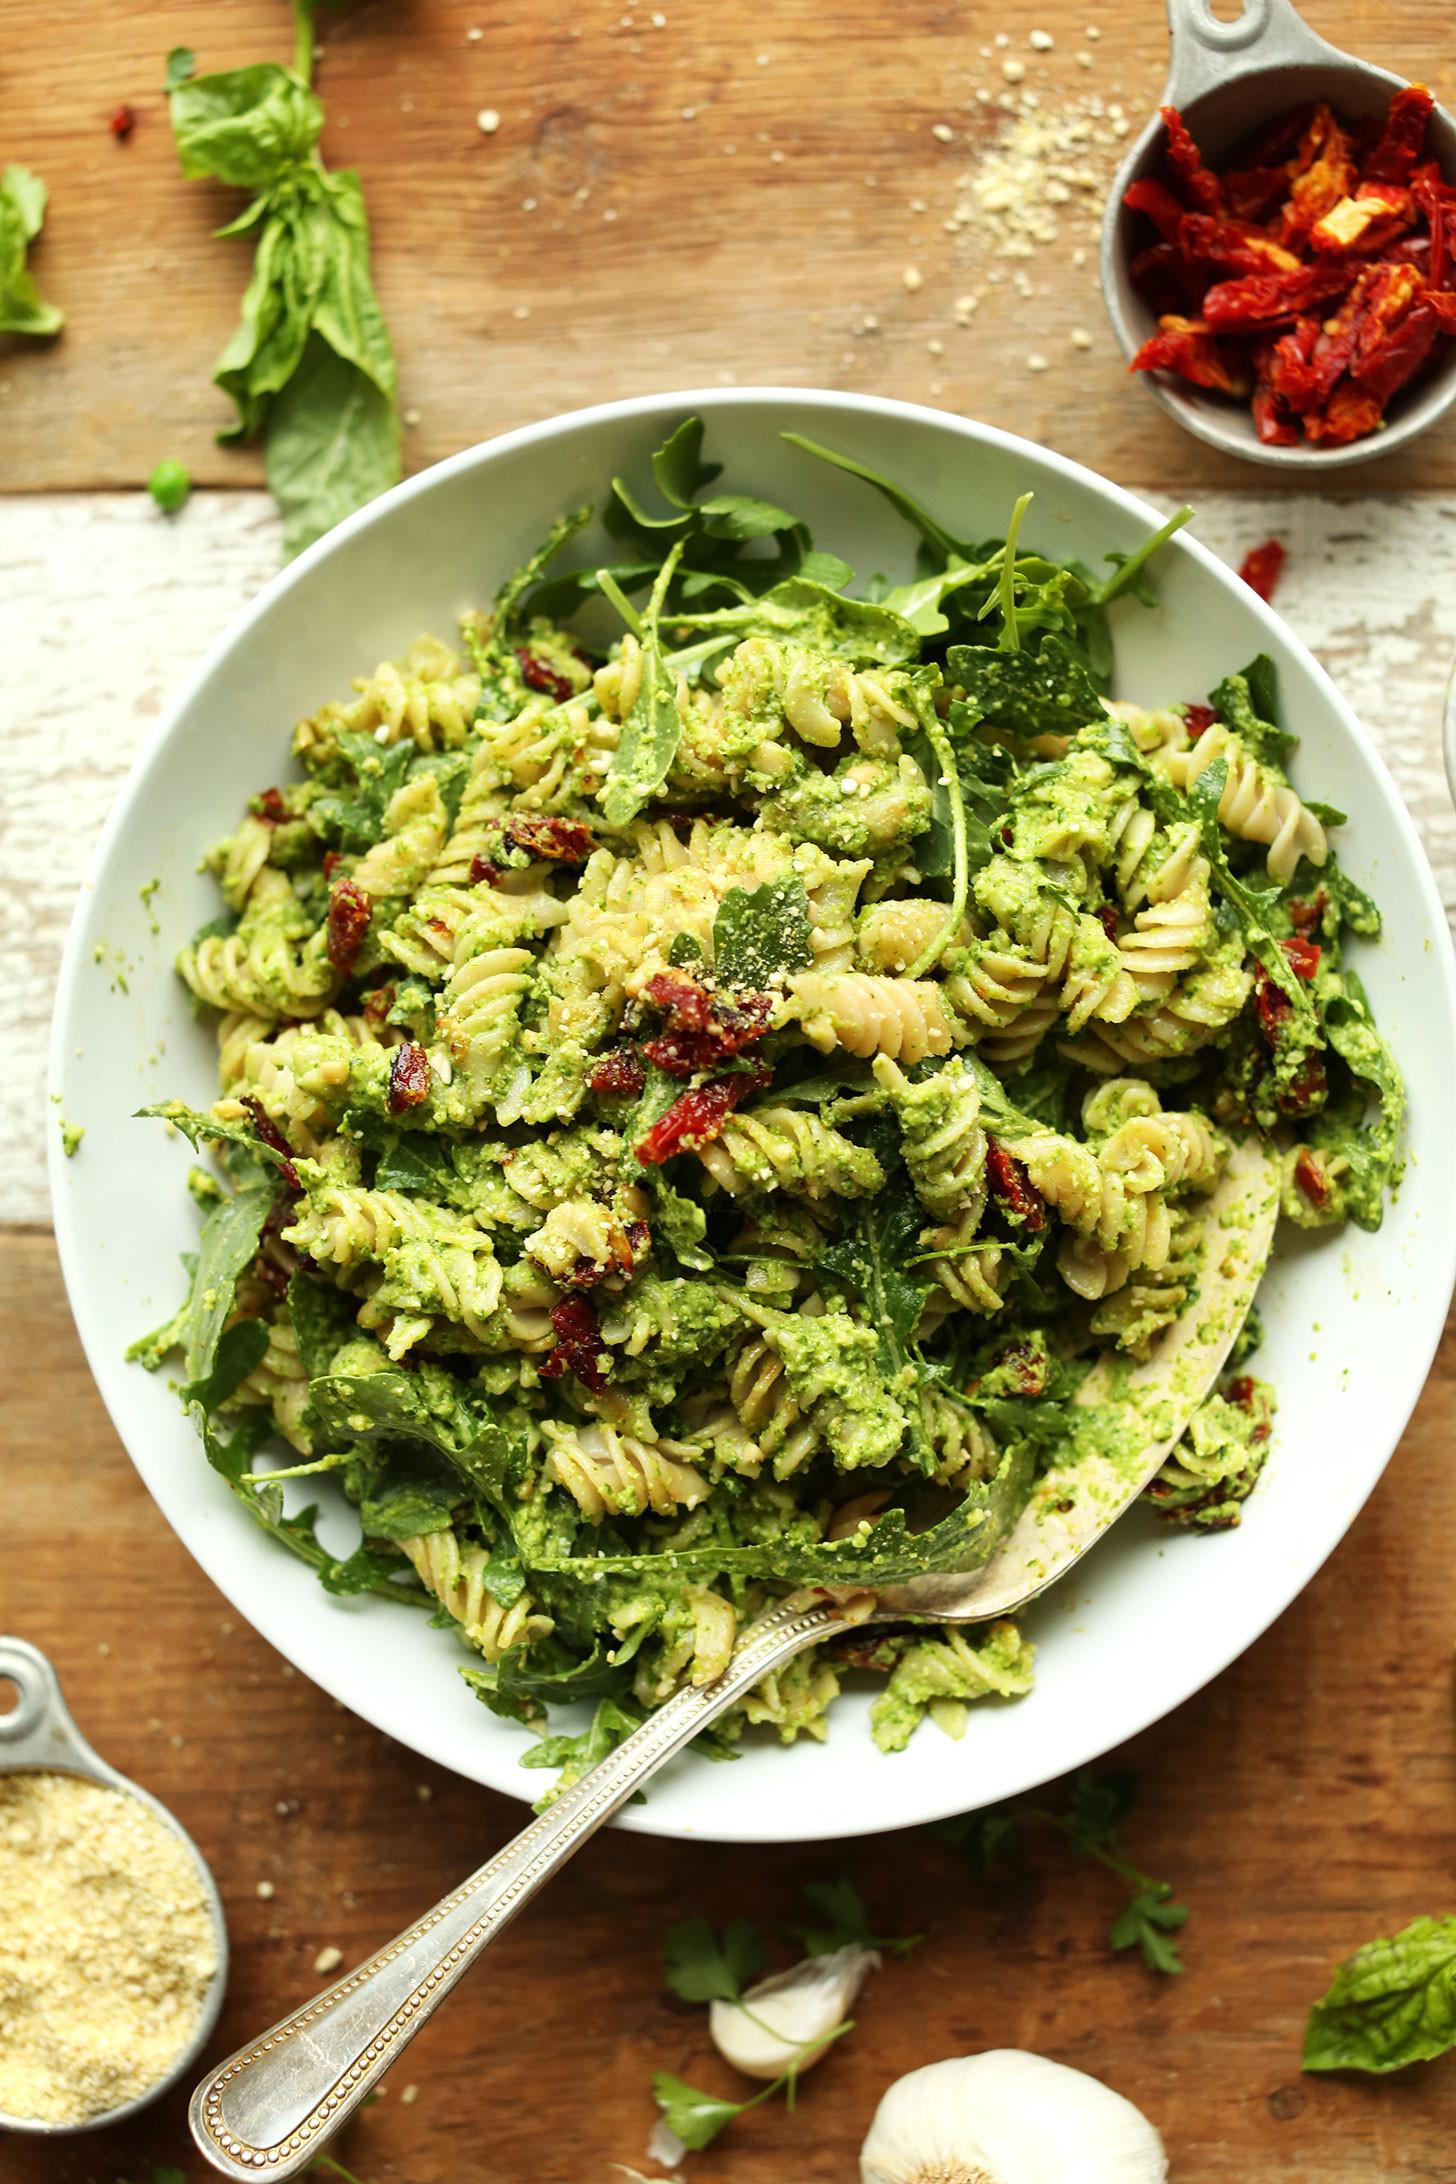 Healthy Pesto Pasta Salad Recipe  Pea Pesto Pasta with Sun Dried Tomatoes